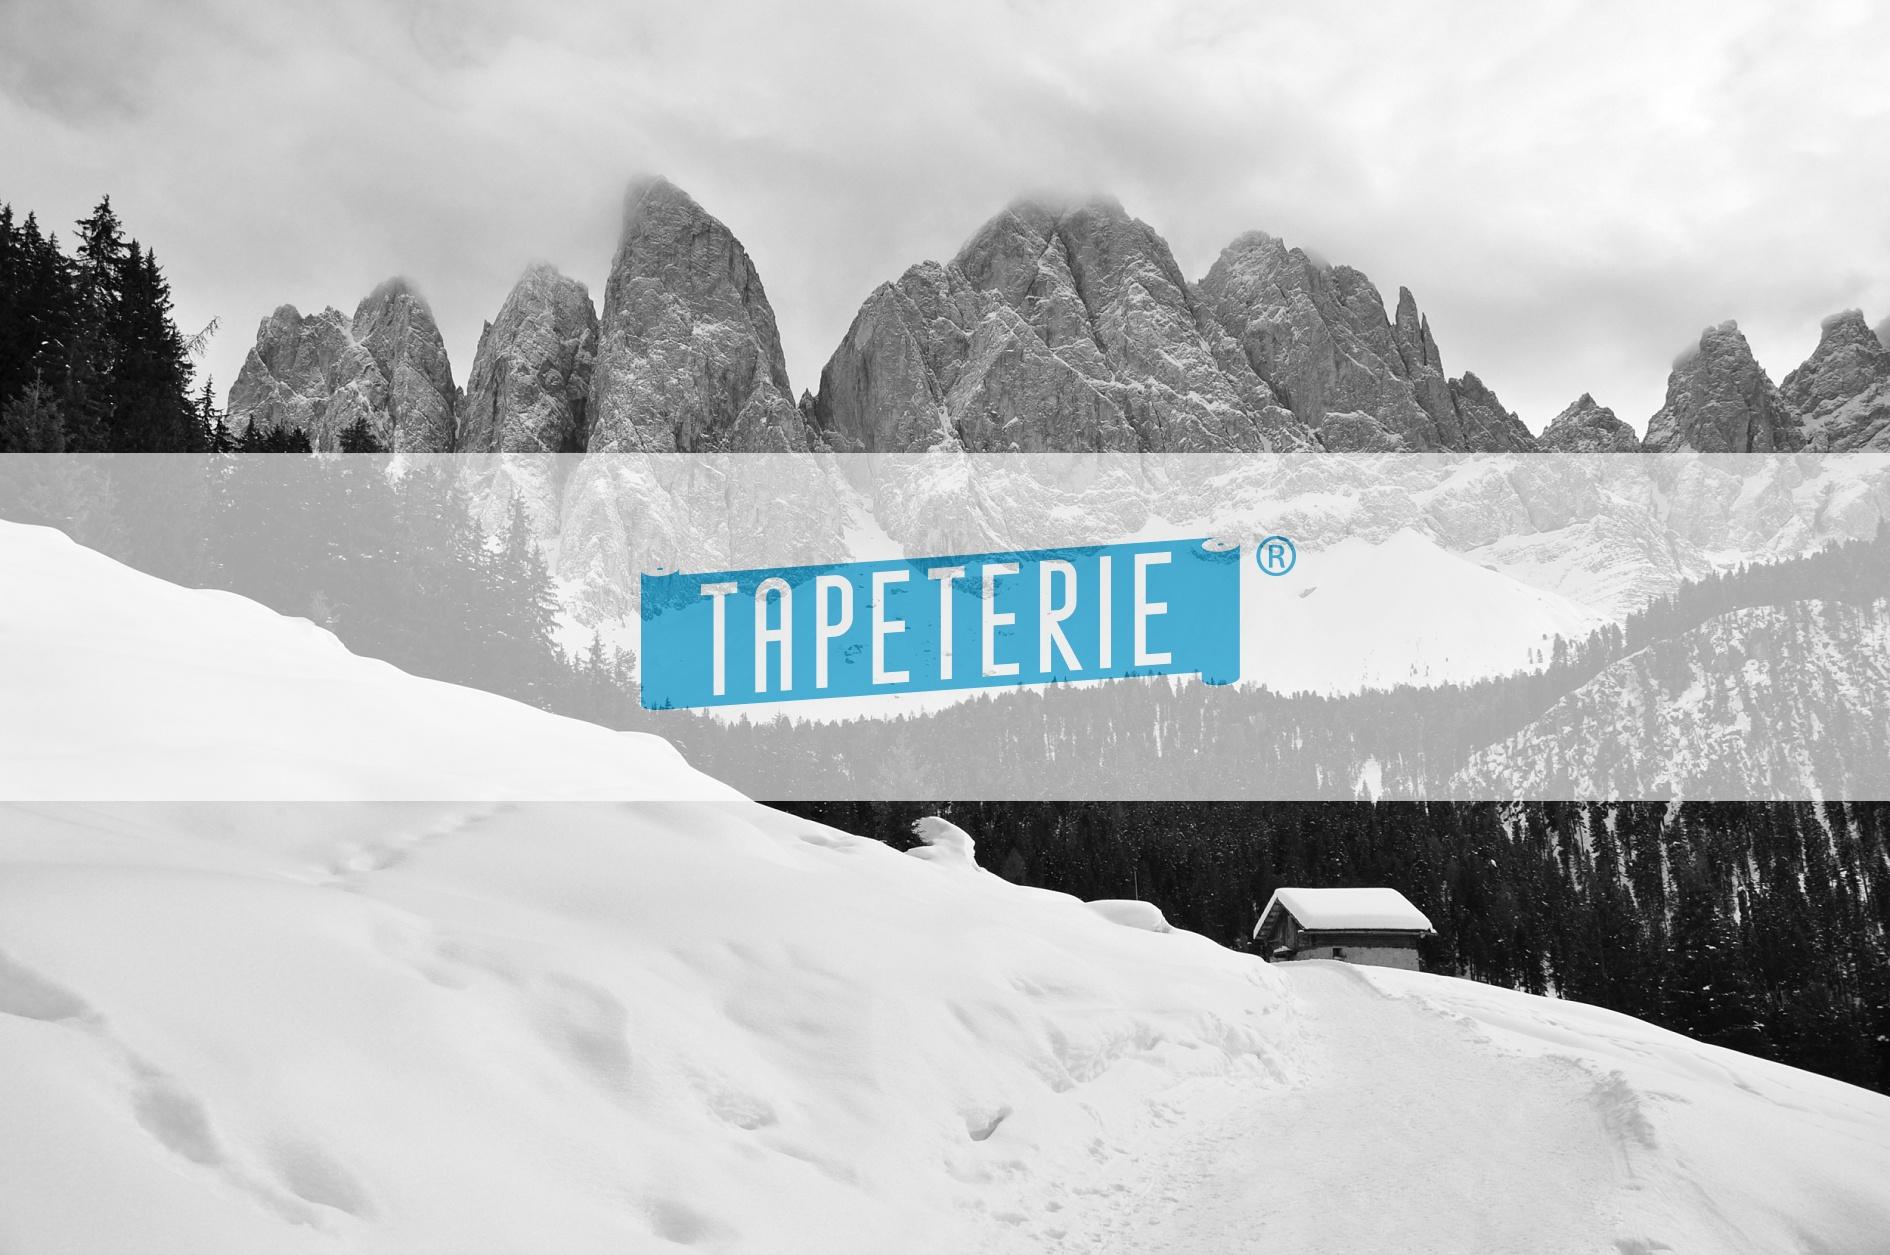 Fototapeten Winterlandschaft : Fototapete Nebeneinander – Bergmassiv mit Schnee Tapeterie